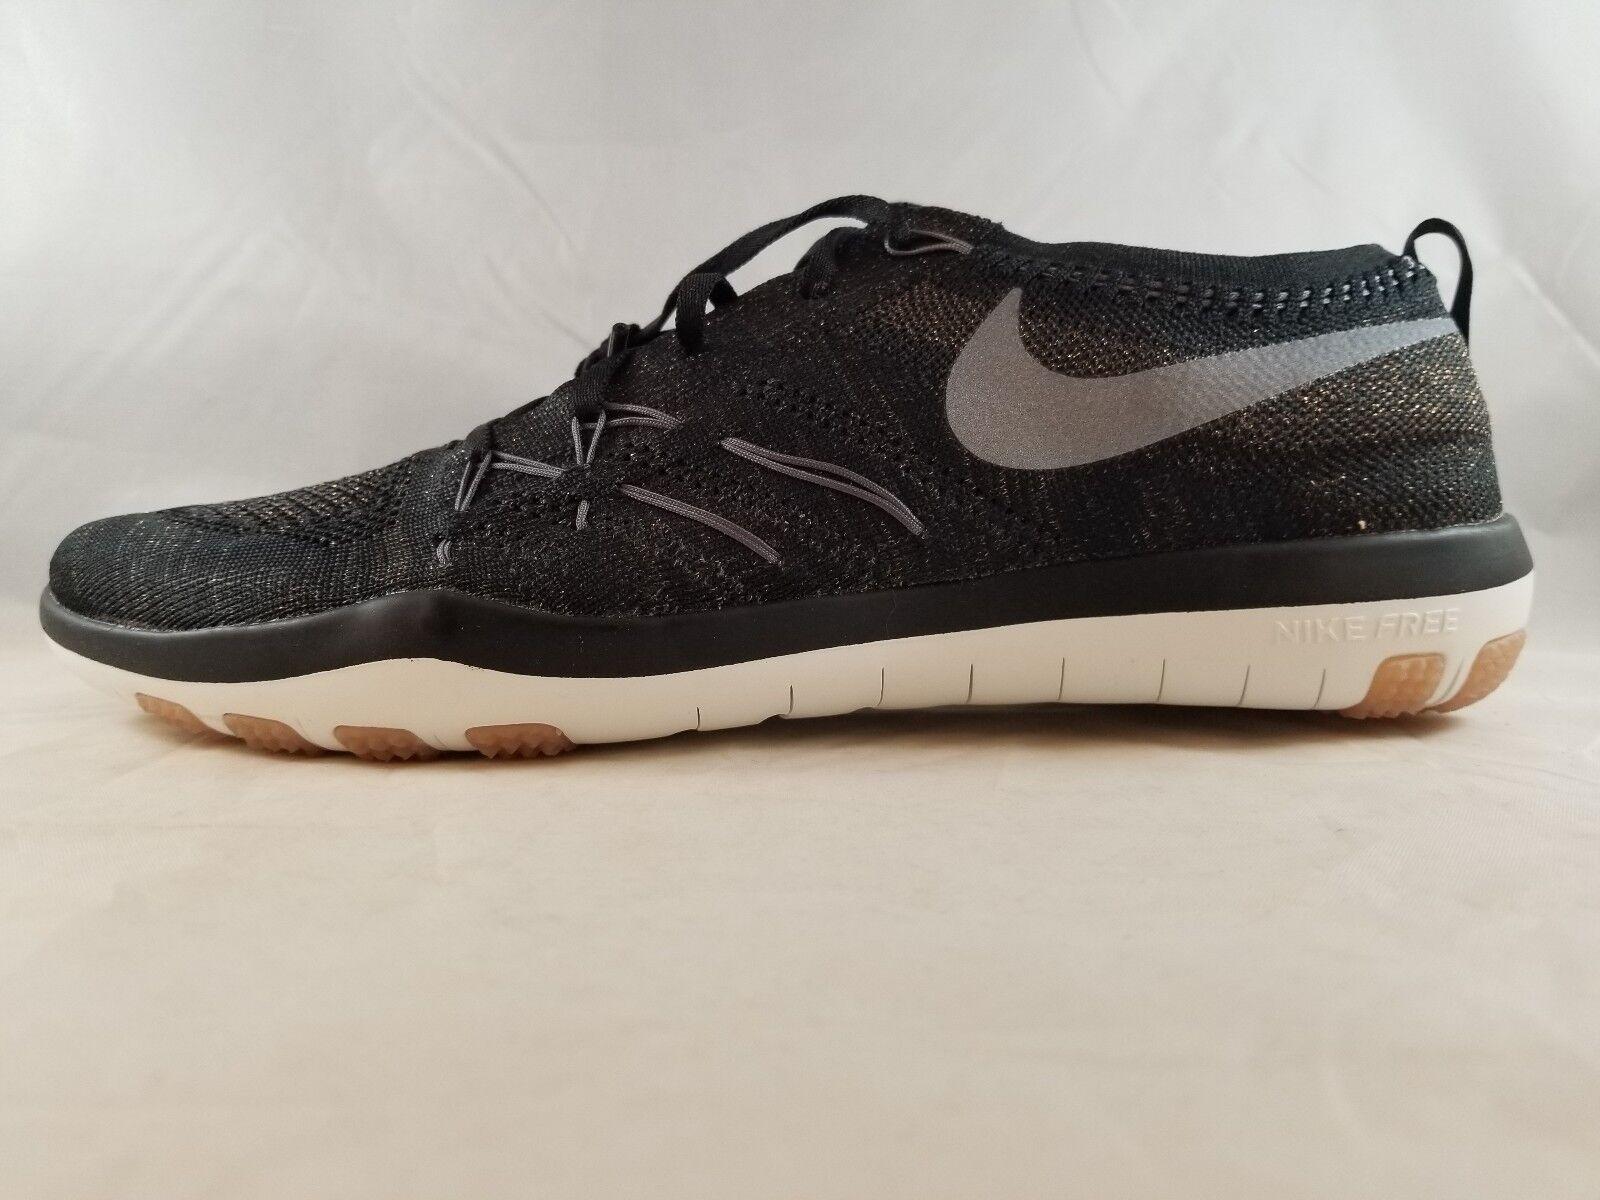 Nike air pegasus 89 tech si 881180-001 grigio - arancione donne scarpe taglia 7